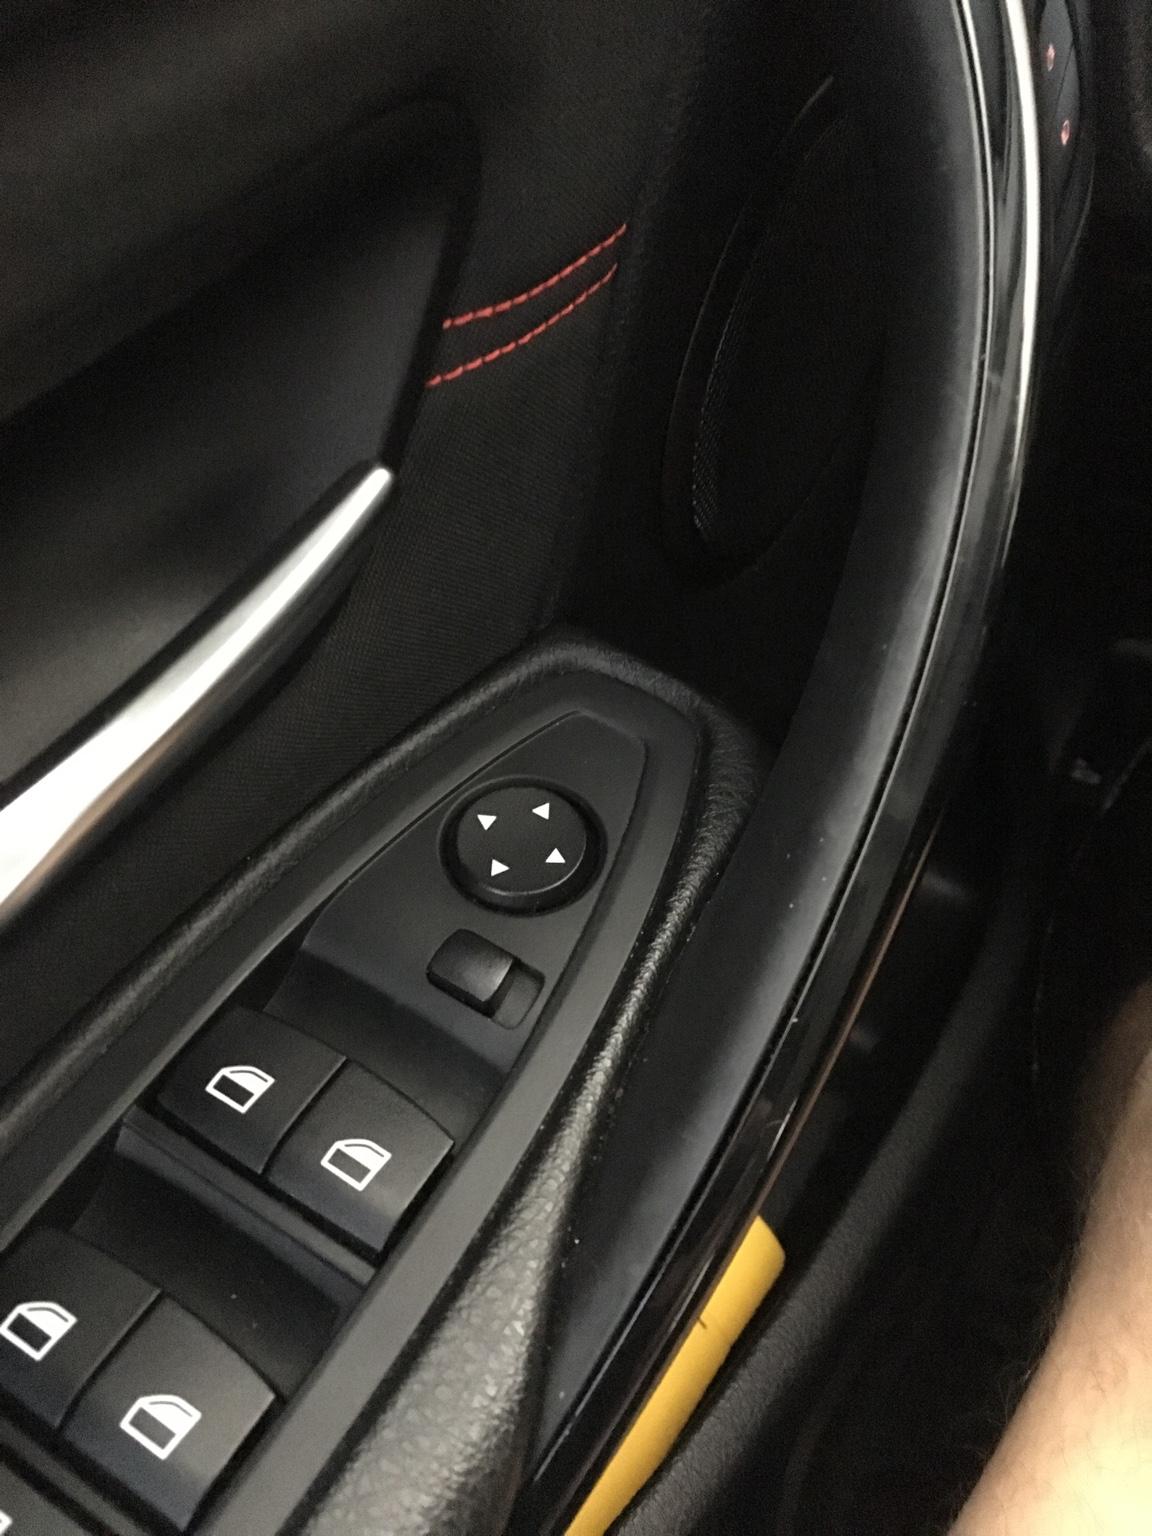 Mirror tilt coding F30 - Bimmerfest - BMW Forums